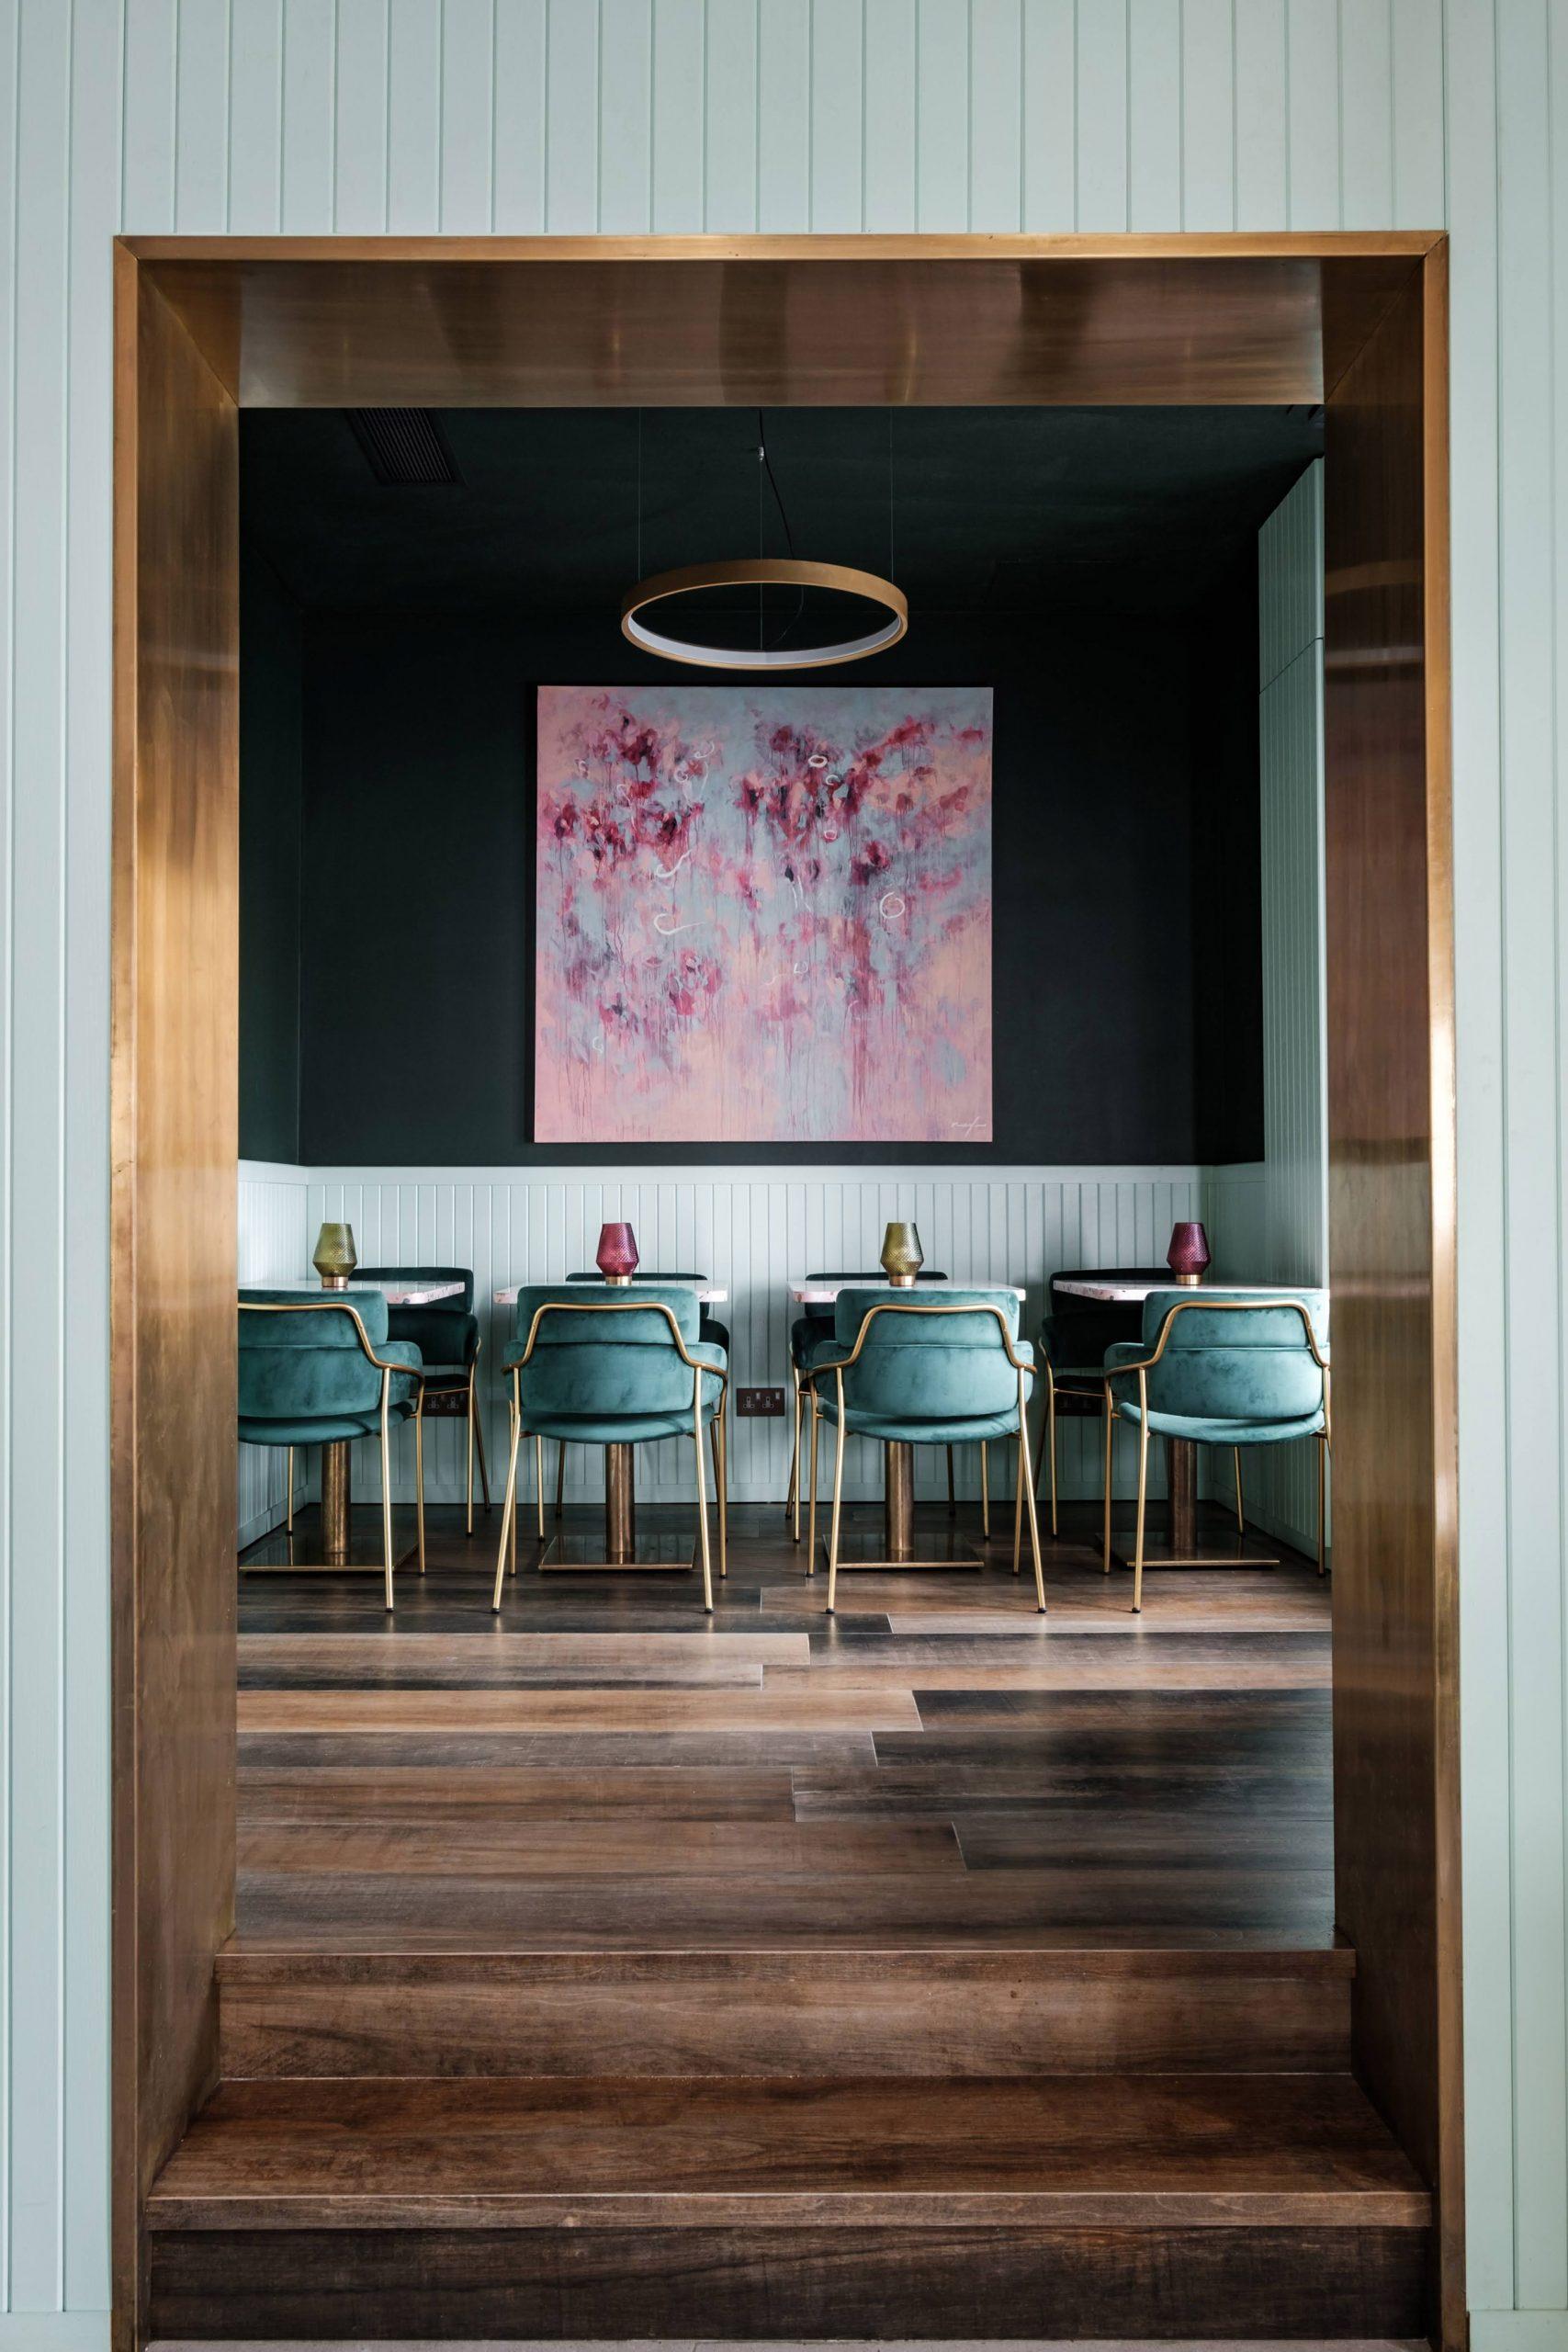 Barbajean restaurant in Malta has a pink and green interiors